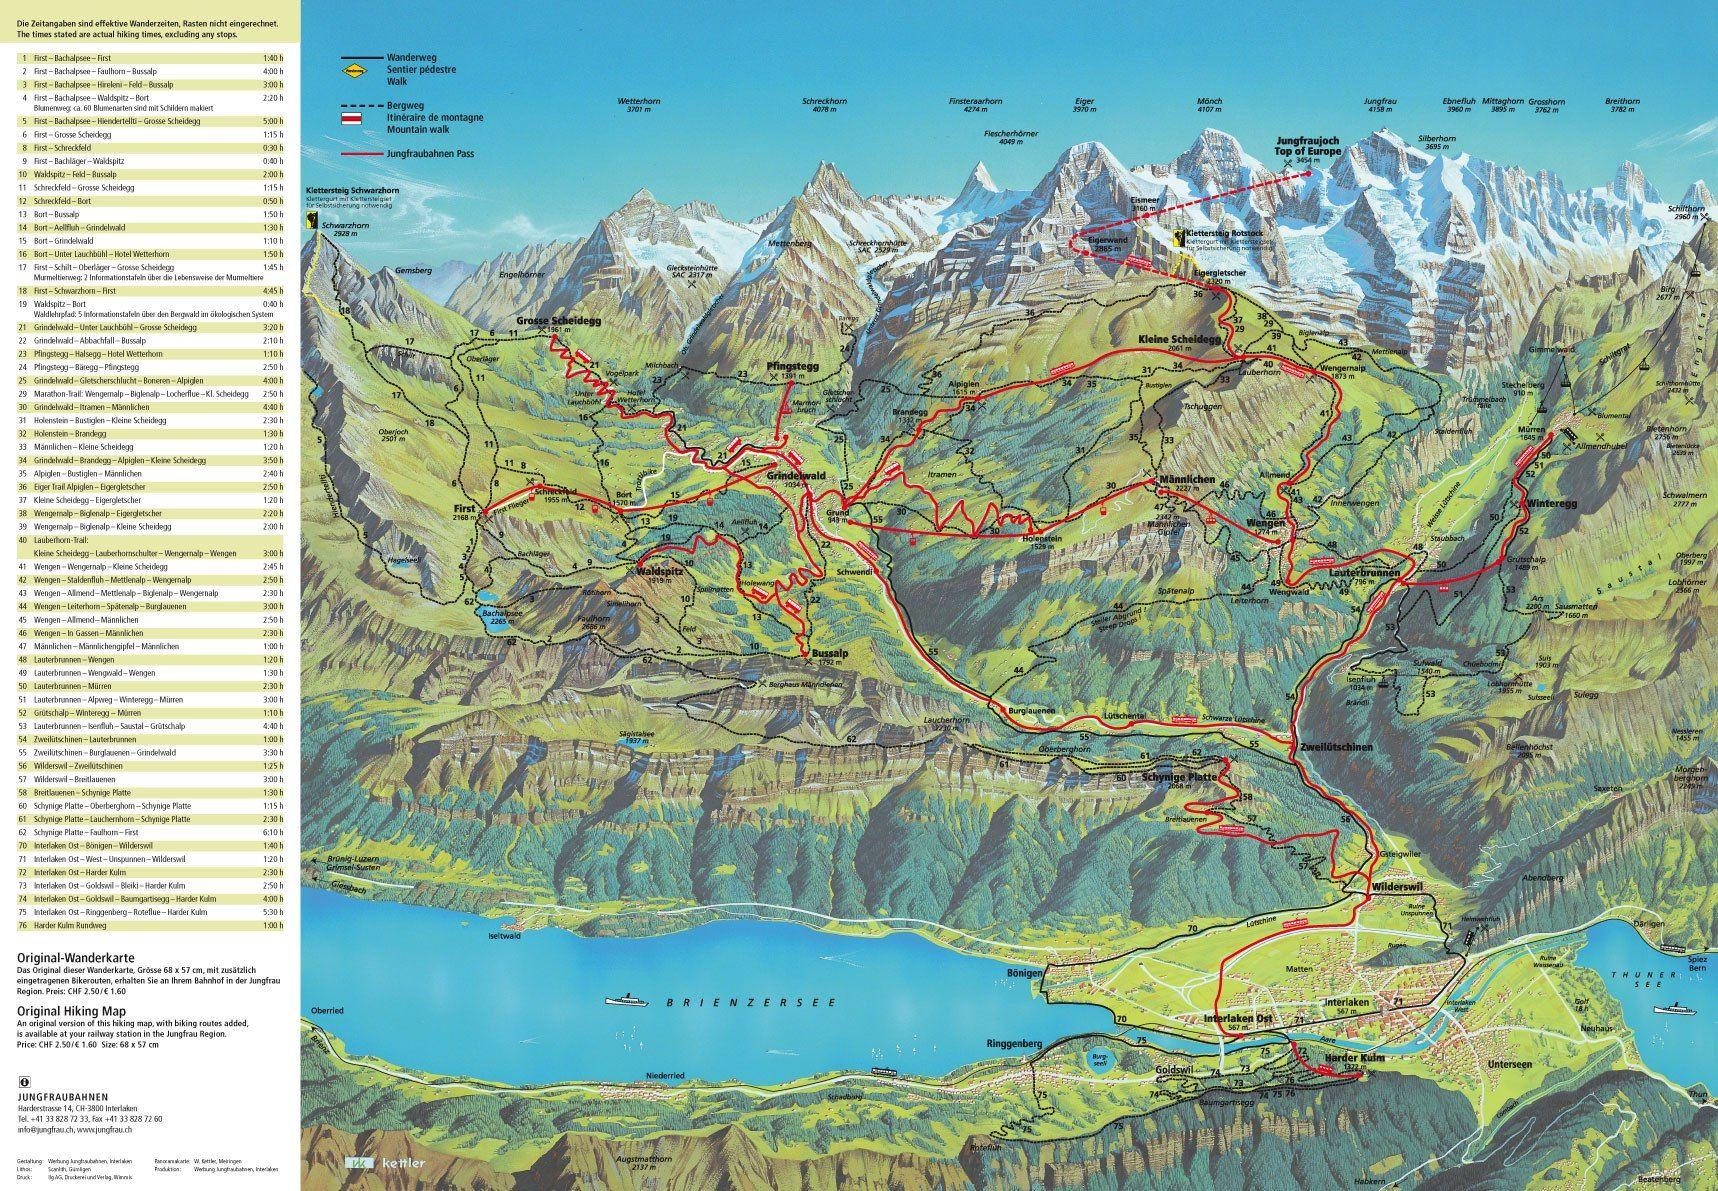 i1.wp.com www.troupinaround.com wp-content uploads 2012 10 map-of-jungfrauregion1.jpg